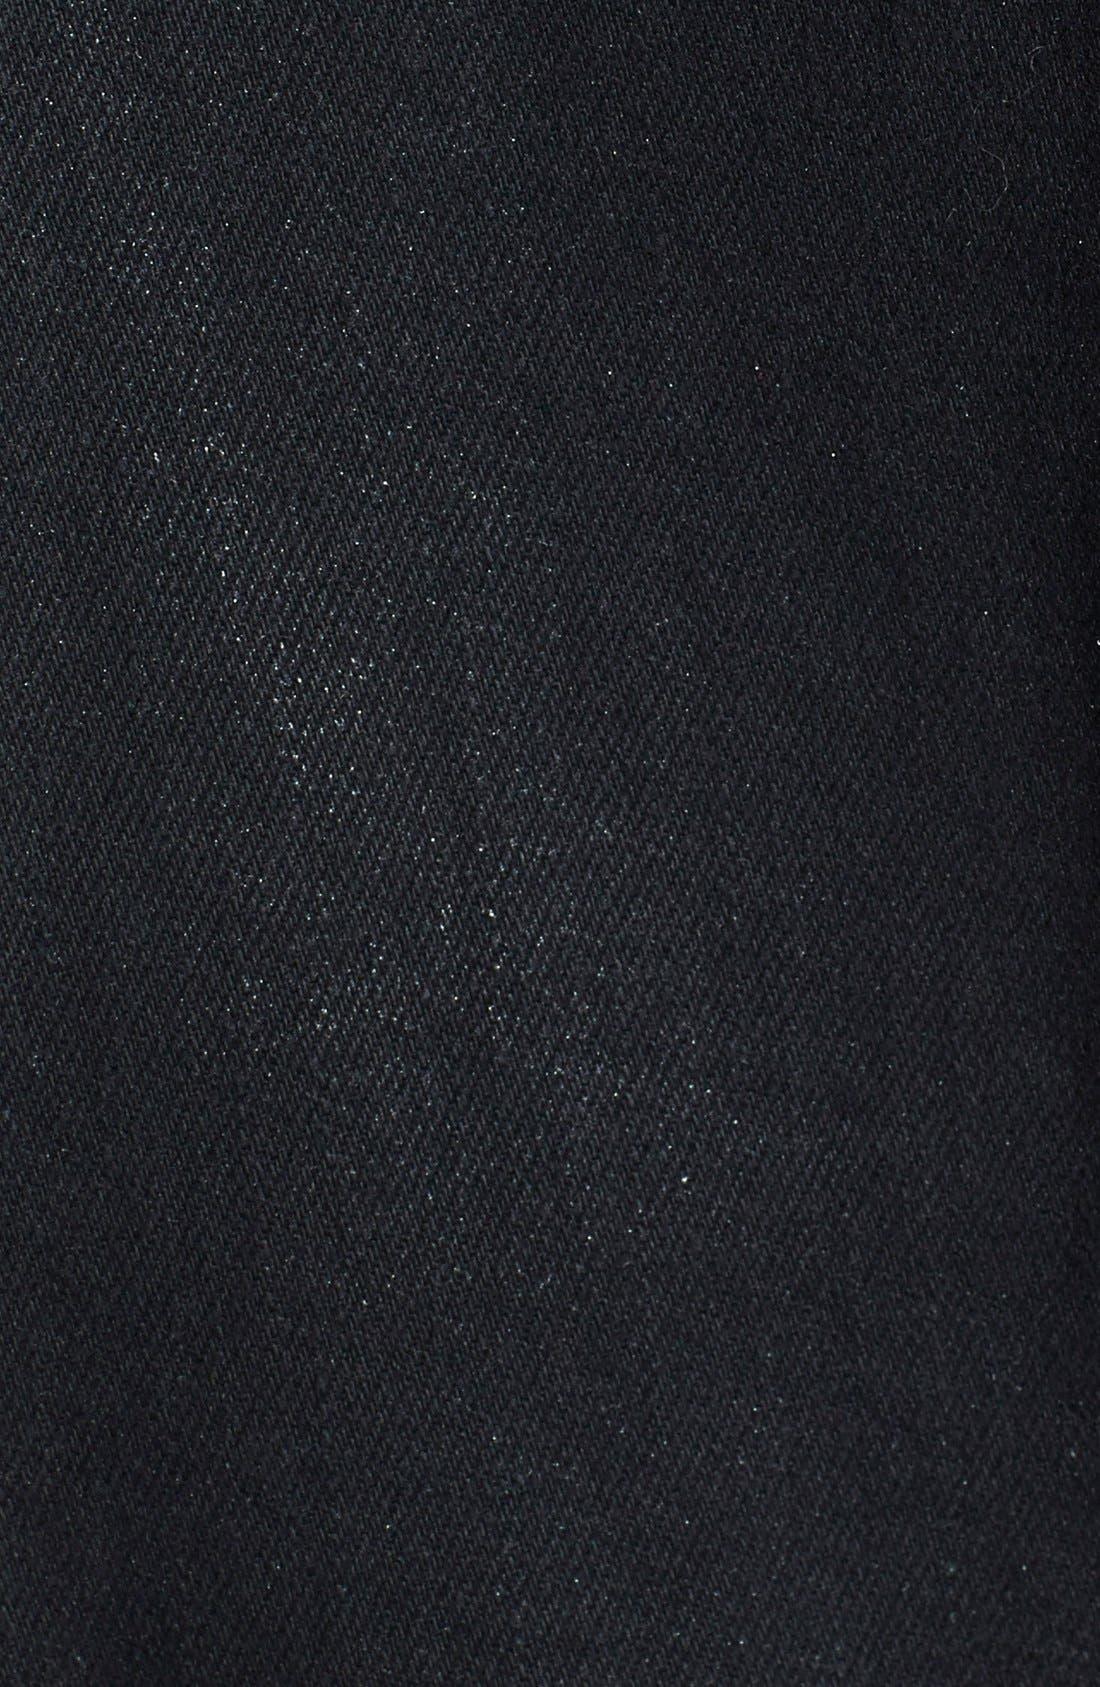 'Cynic' Moto Jacket,                             Alternate thumbnail 5, color,                             001